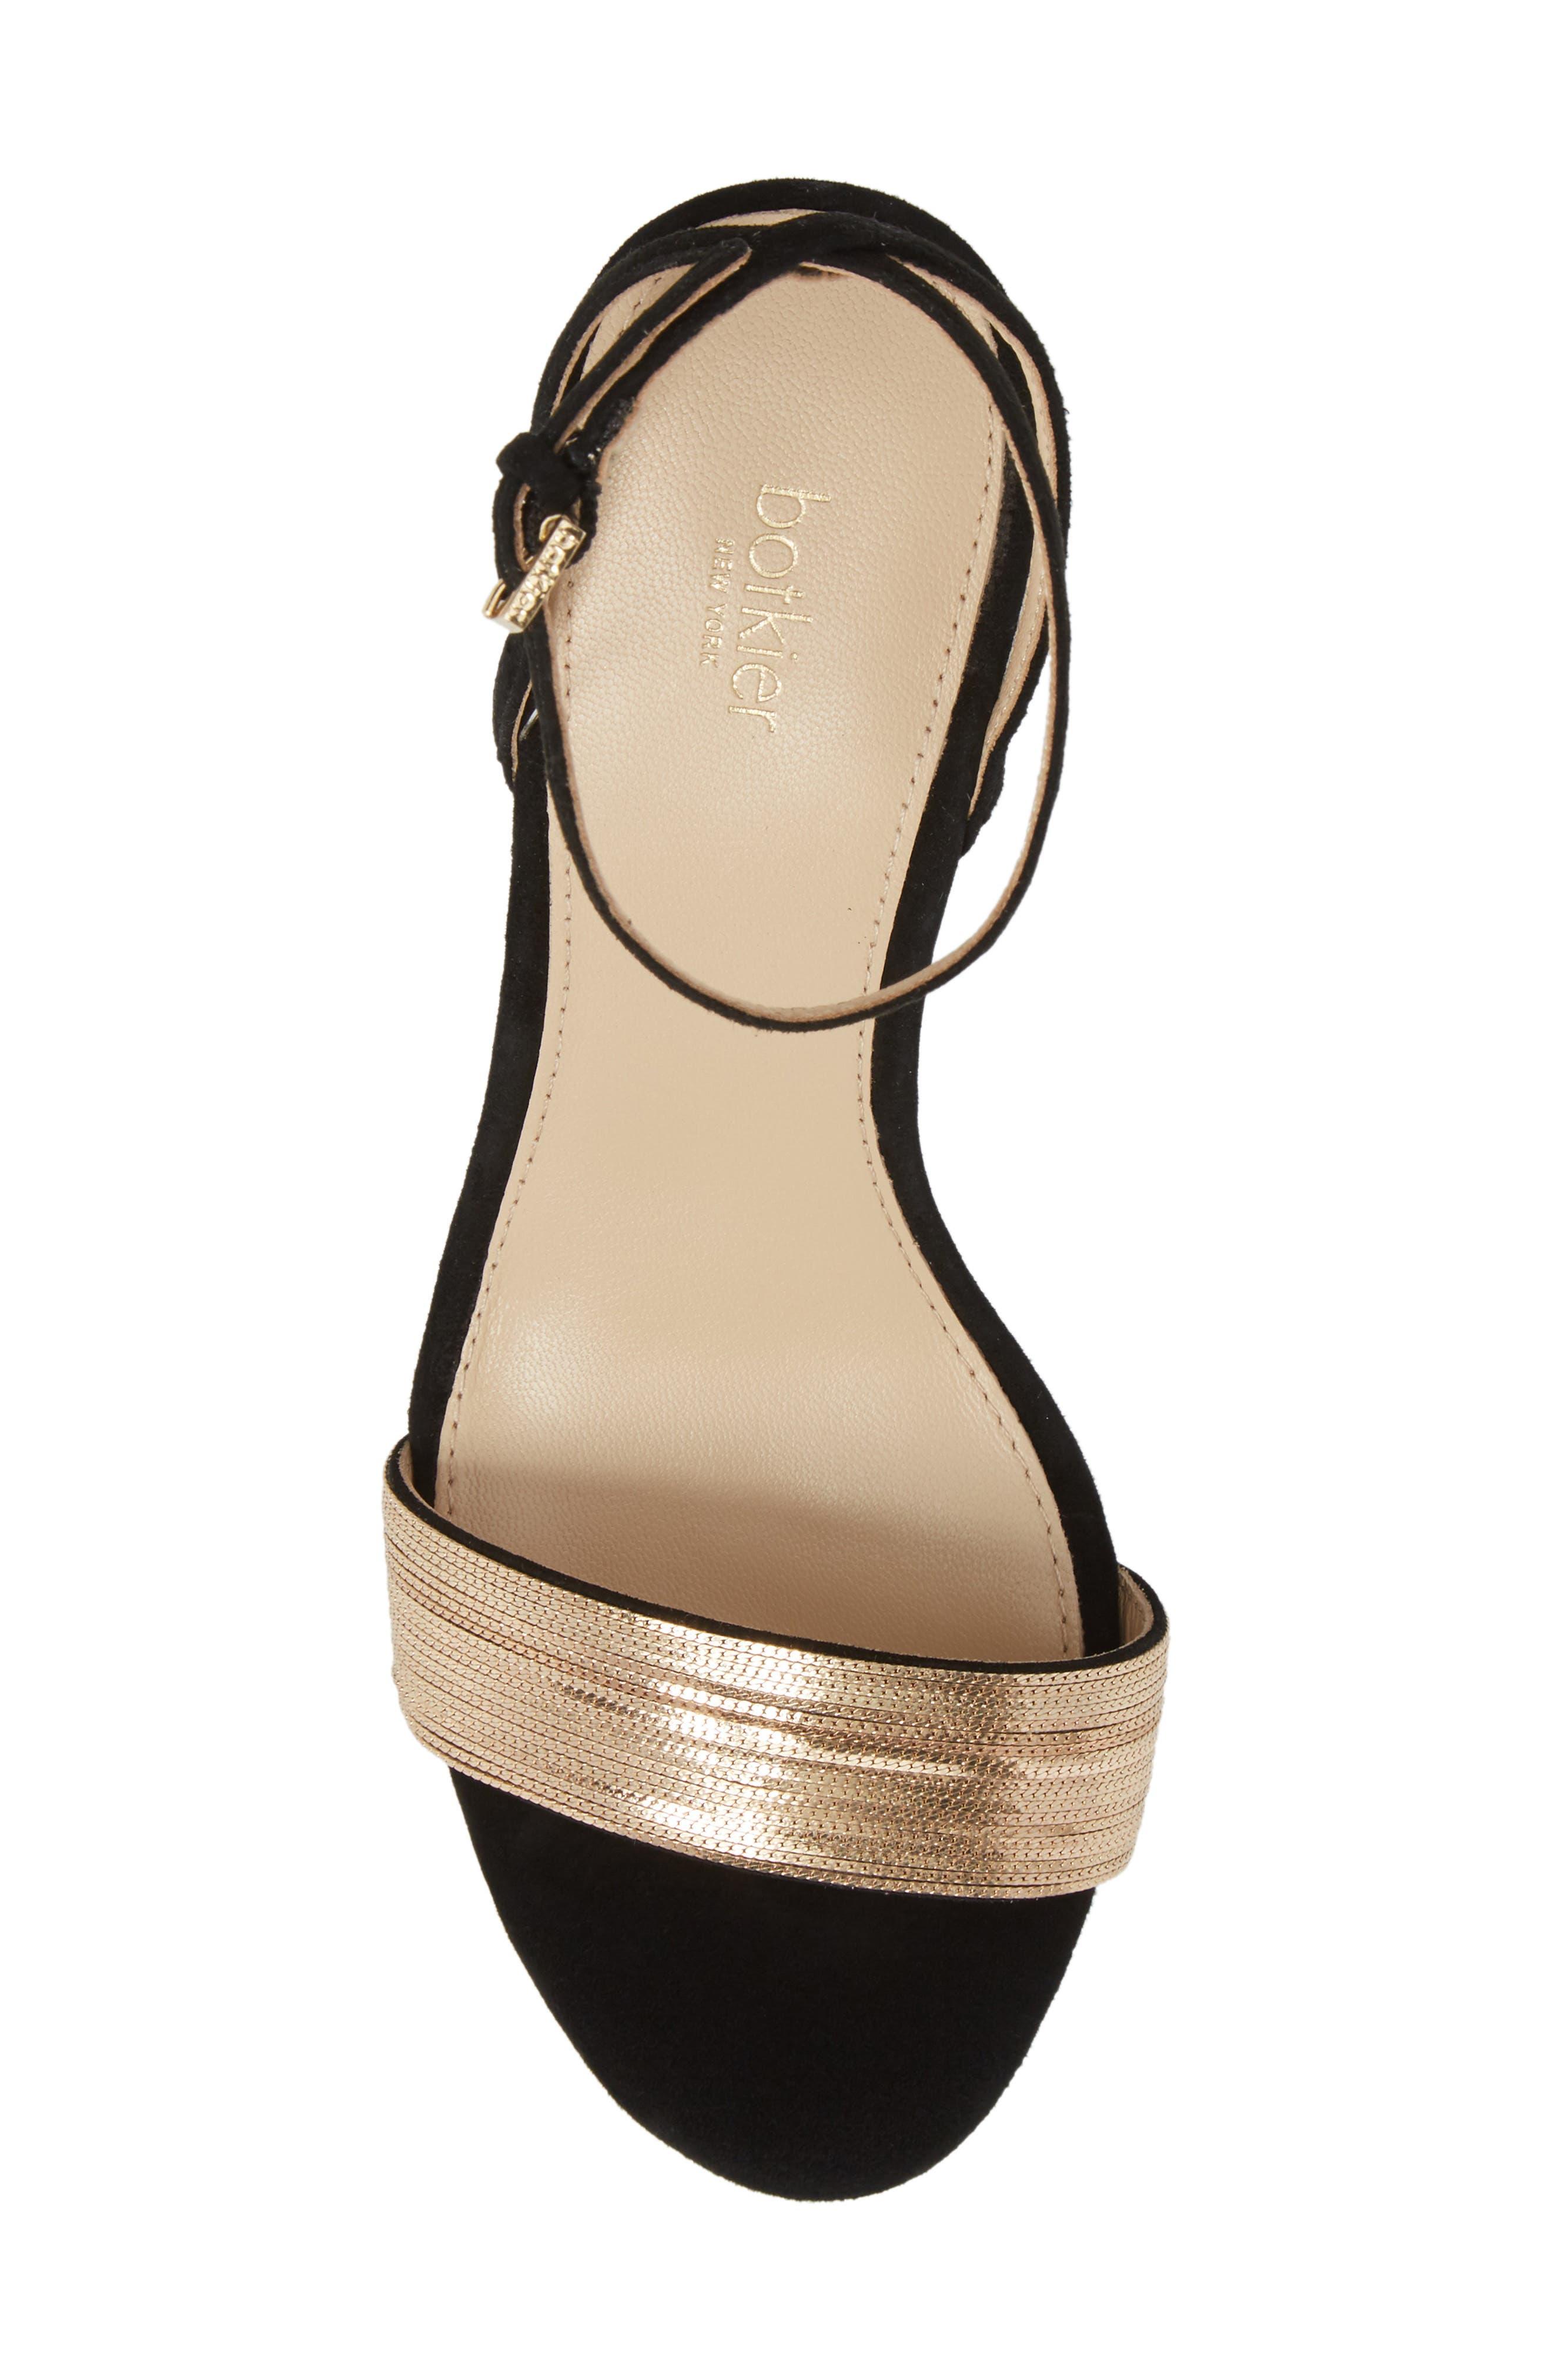 Persi Chain Wraparound Sandal,                             Alternate thumbnail 10, color,